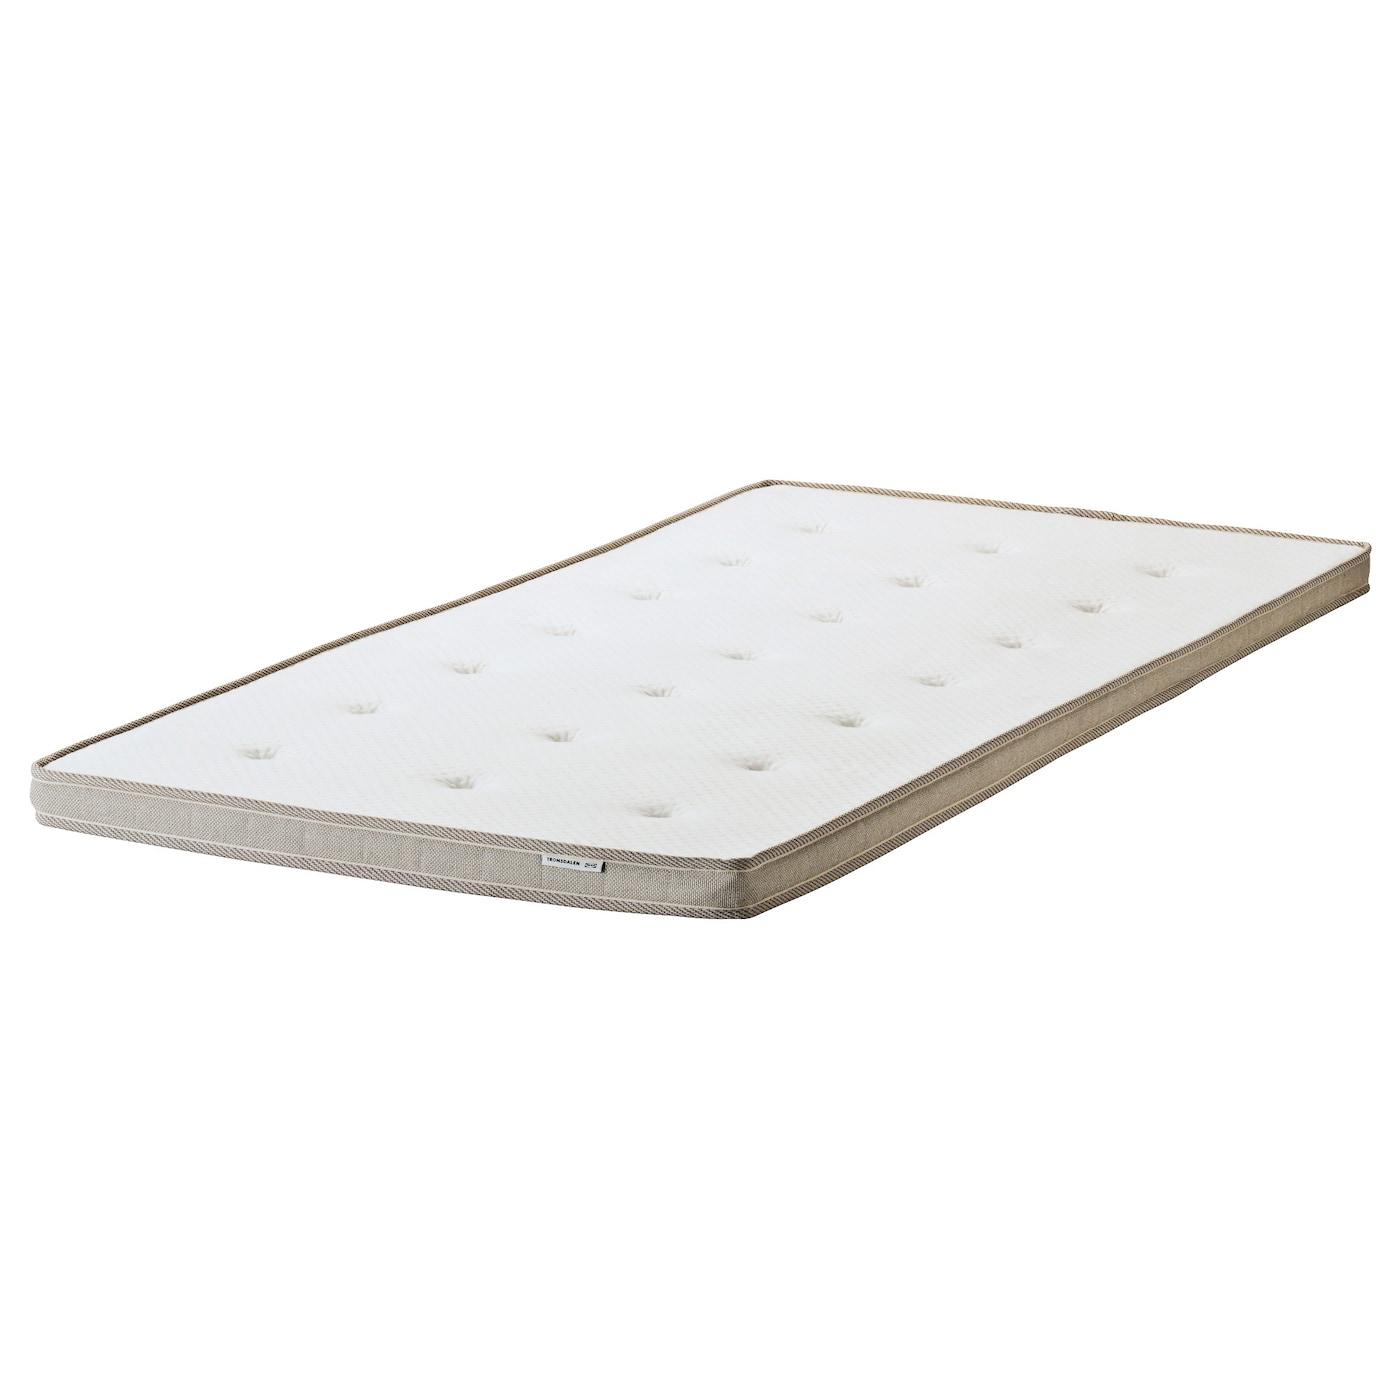 topper bezug 140x200 gro visco topper x best memory foam mattress for back pain inch queen. Black Bedroom Furniture Sets. Home Design Ideas